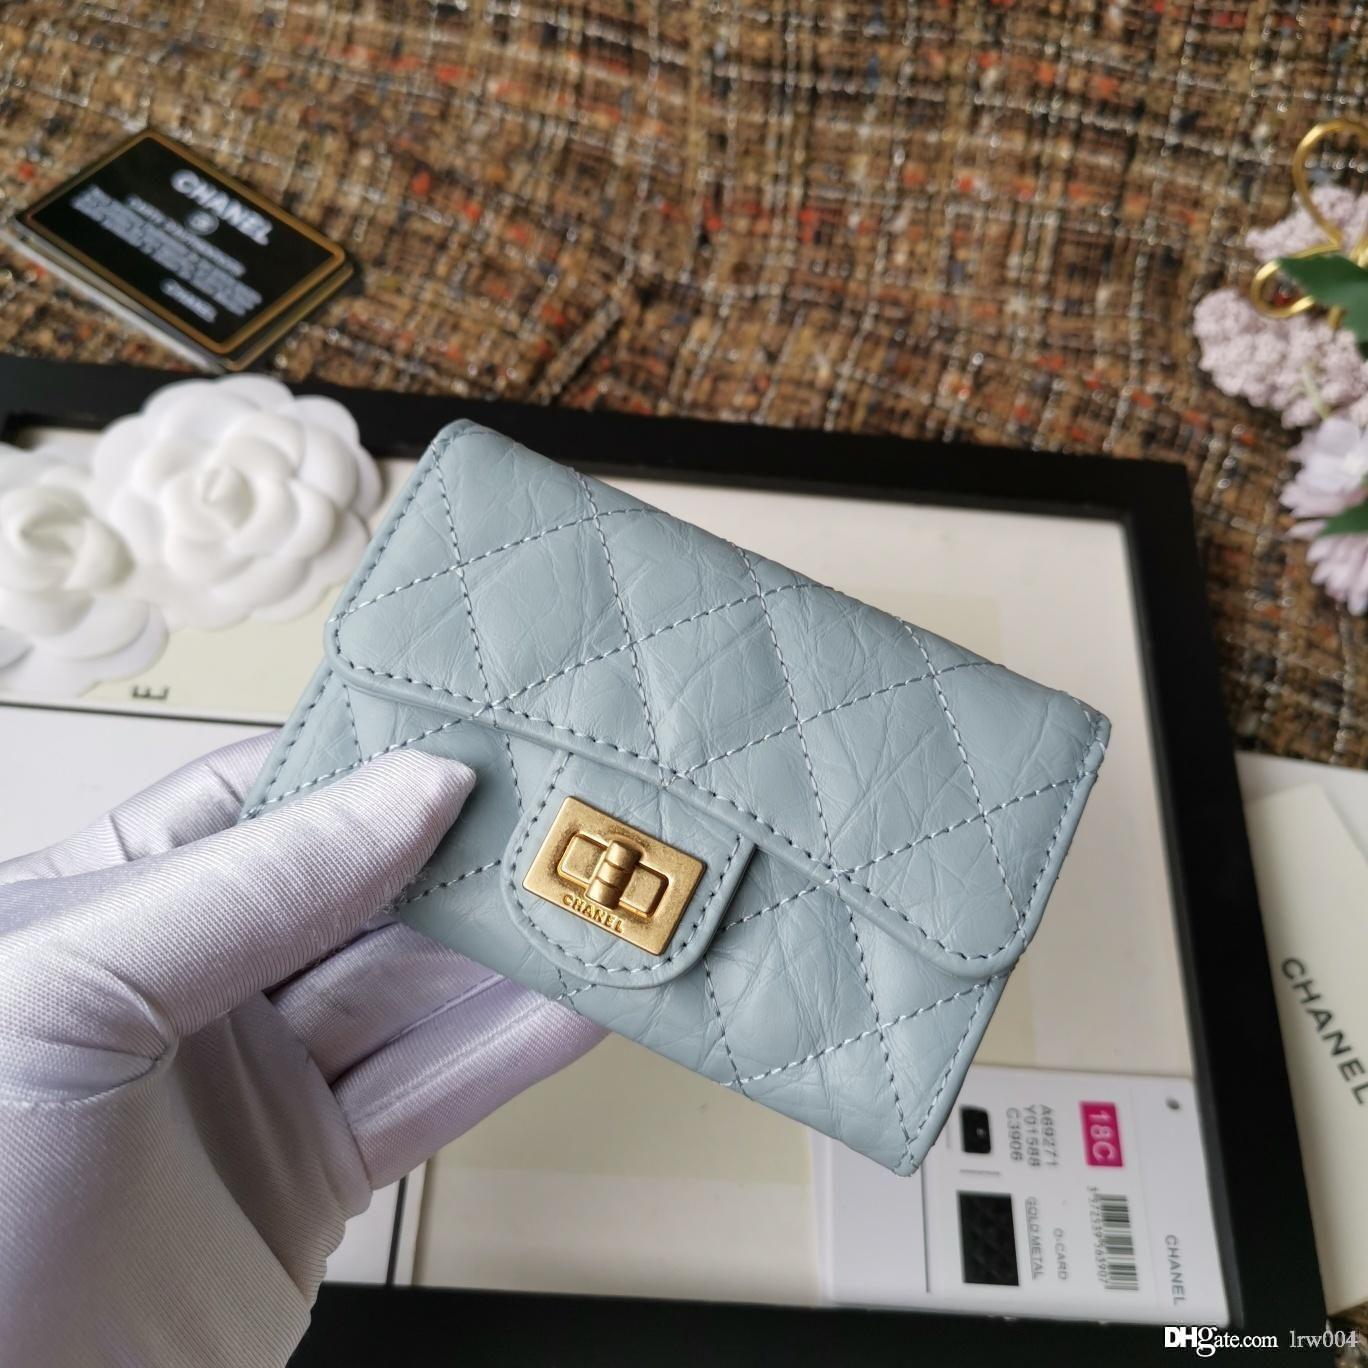 02 Hot new women classic small flap wallet luxury designer bag 80831 women wallet calfskin fashion size 11-8.5cm with box*